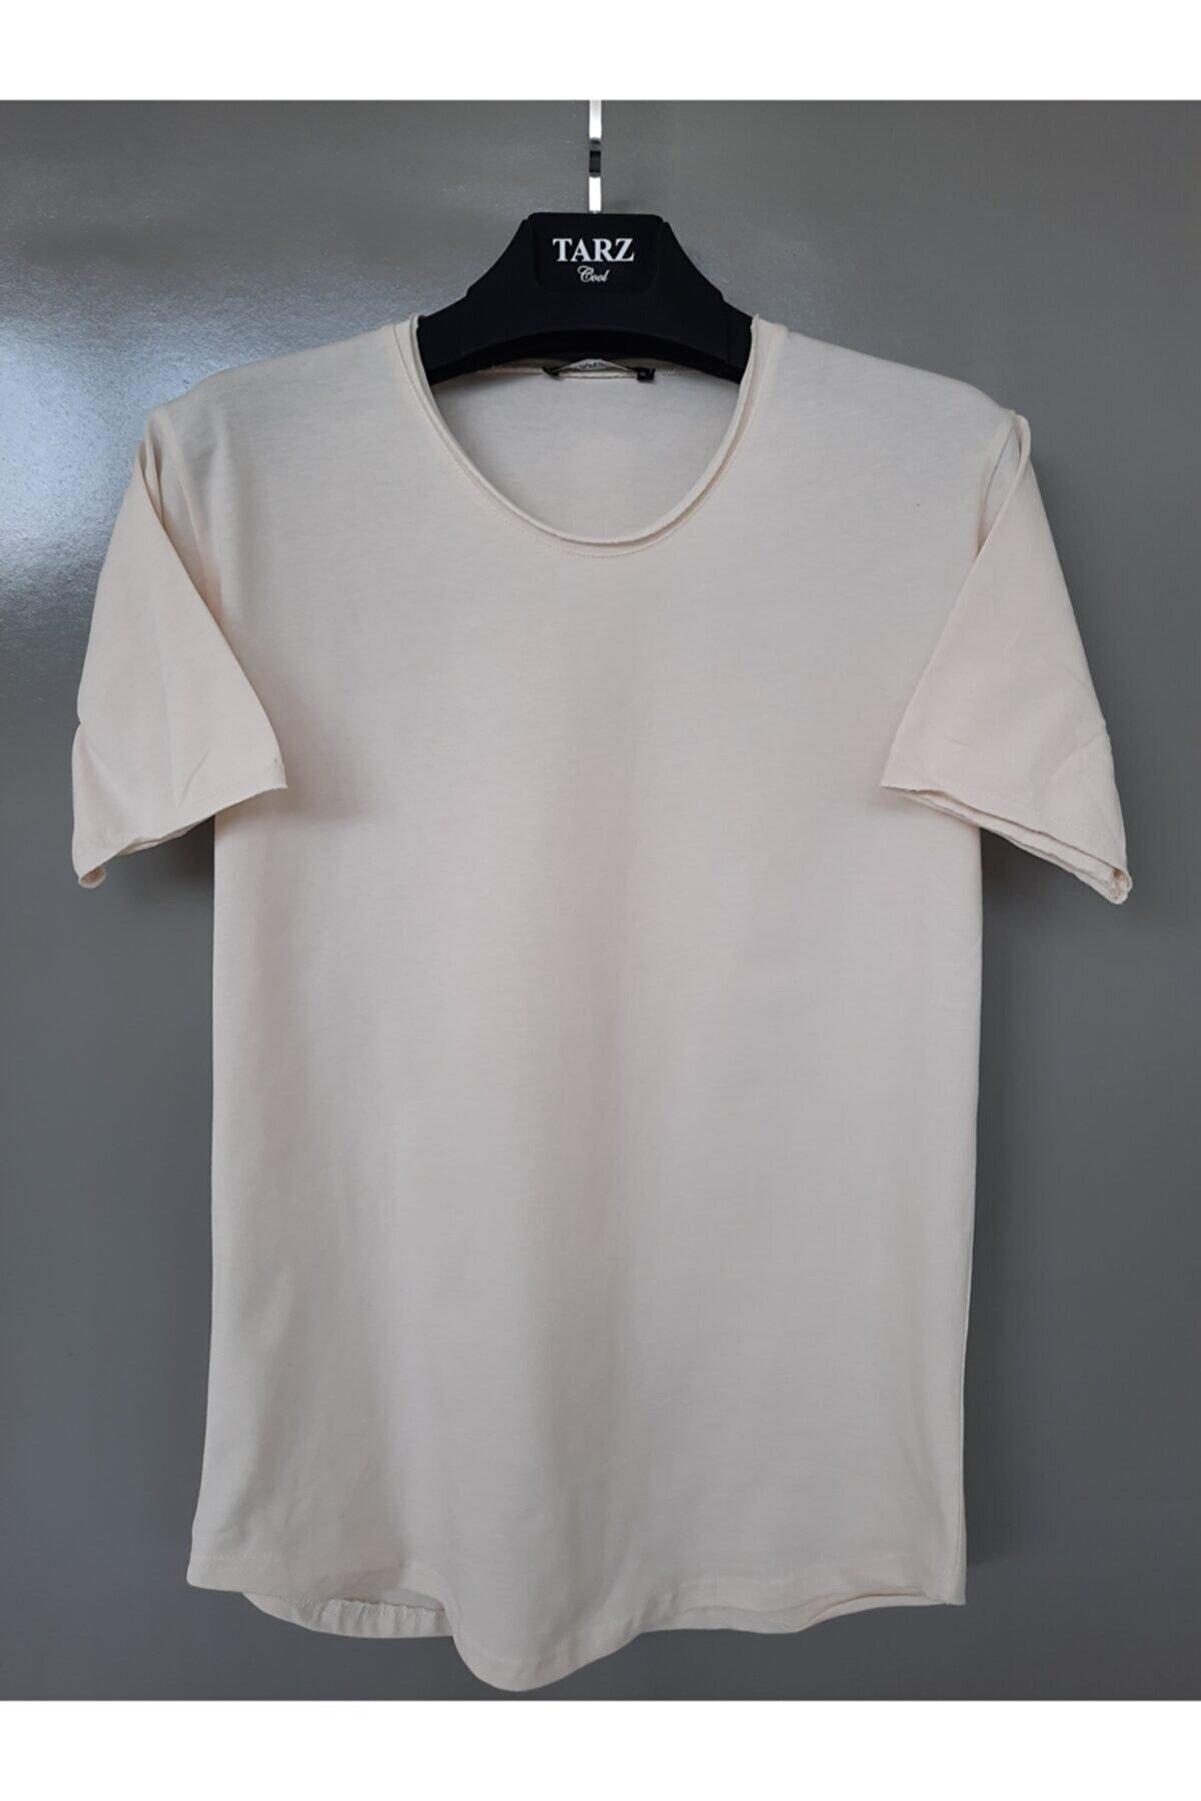 Tarz Cool Erkek Açık Krem Noktalı Pis Yaka Salaş T-shirt